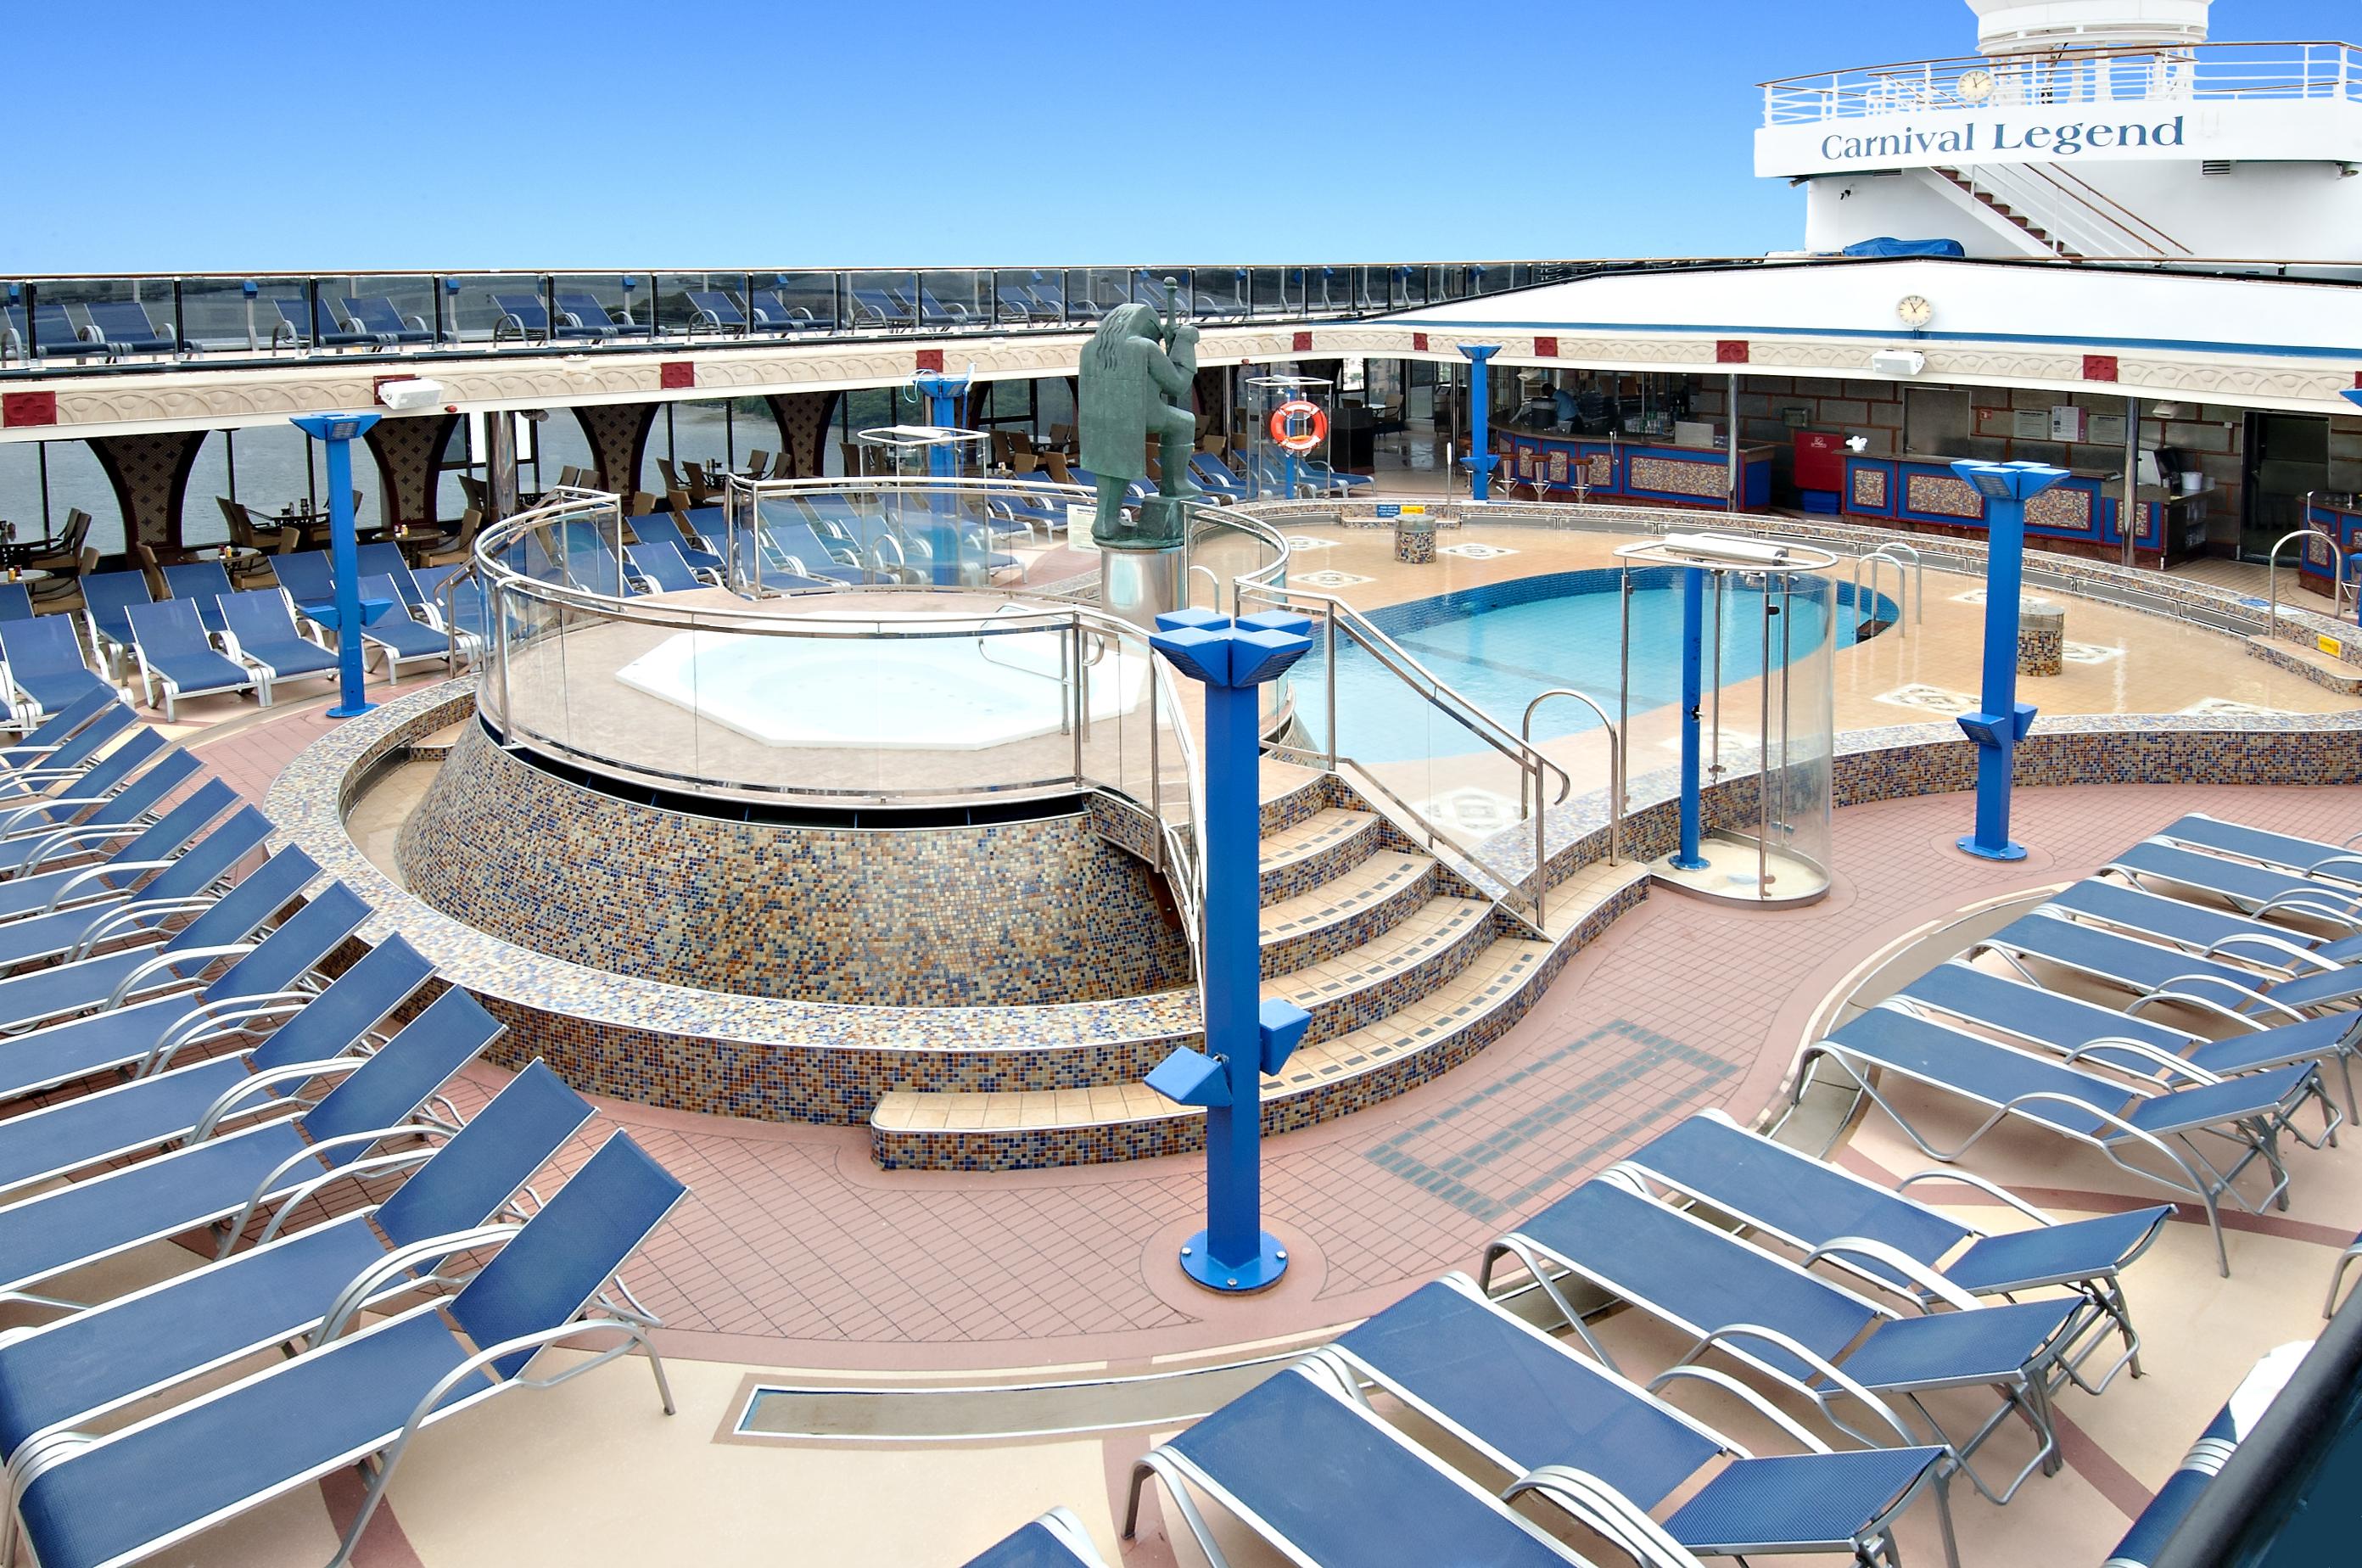 Carnival Legend Avalon Pool 1.jpg